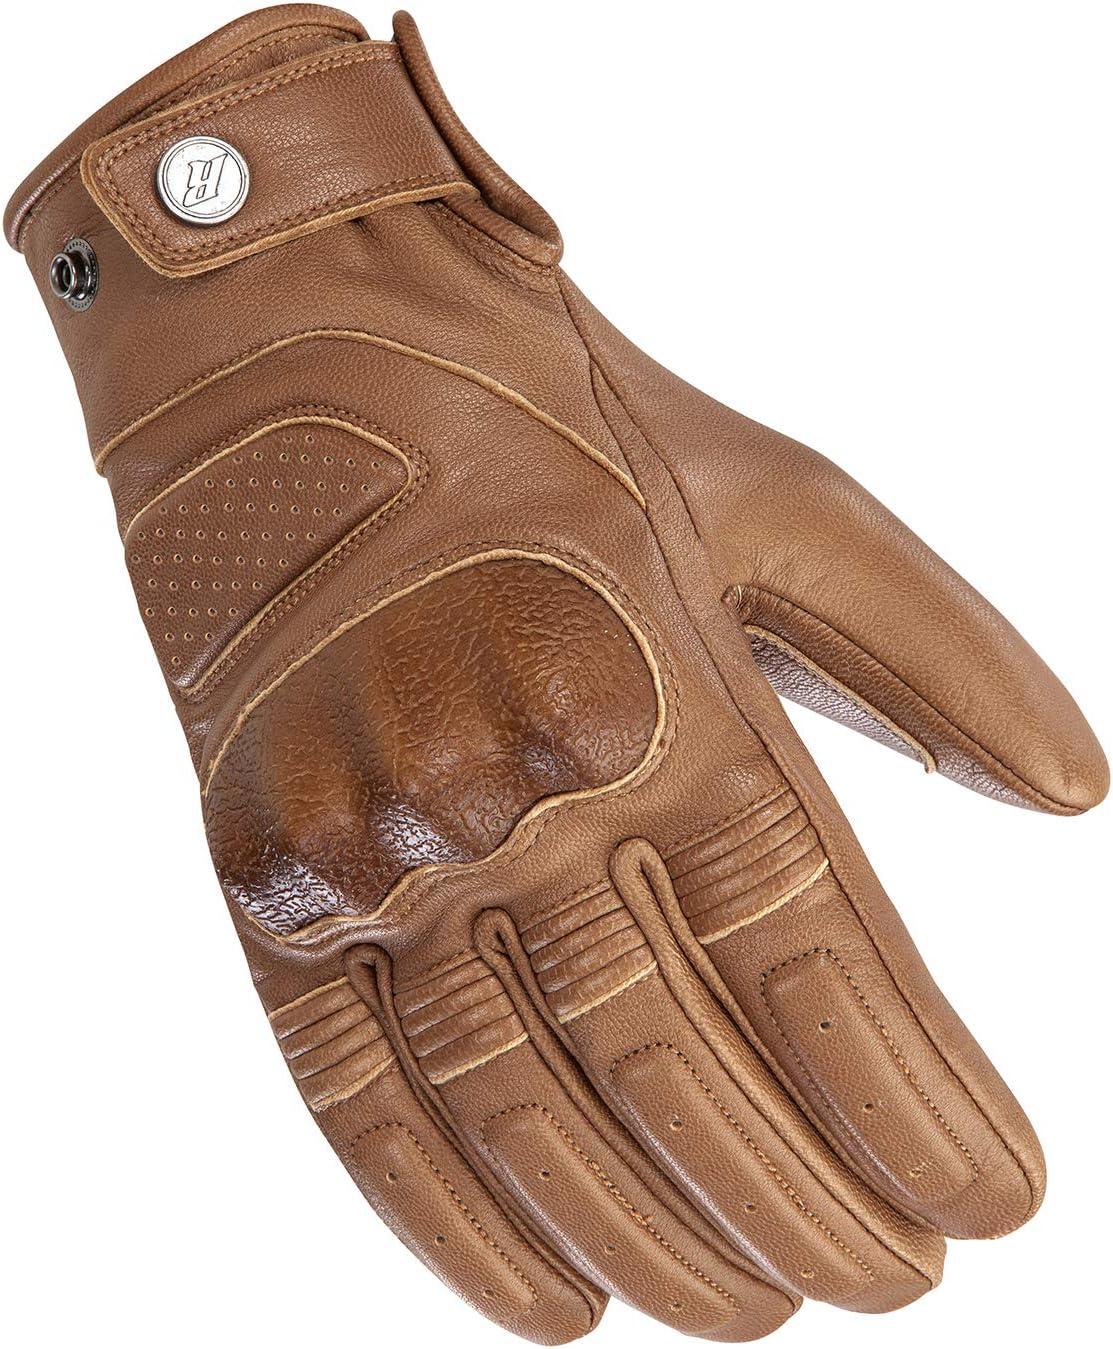 Joe Rocket Men's Woodbridge Motorcycle Glove XXX-Larg Tan In a popularity Dark New mail order